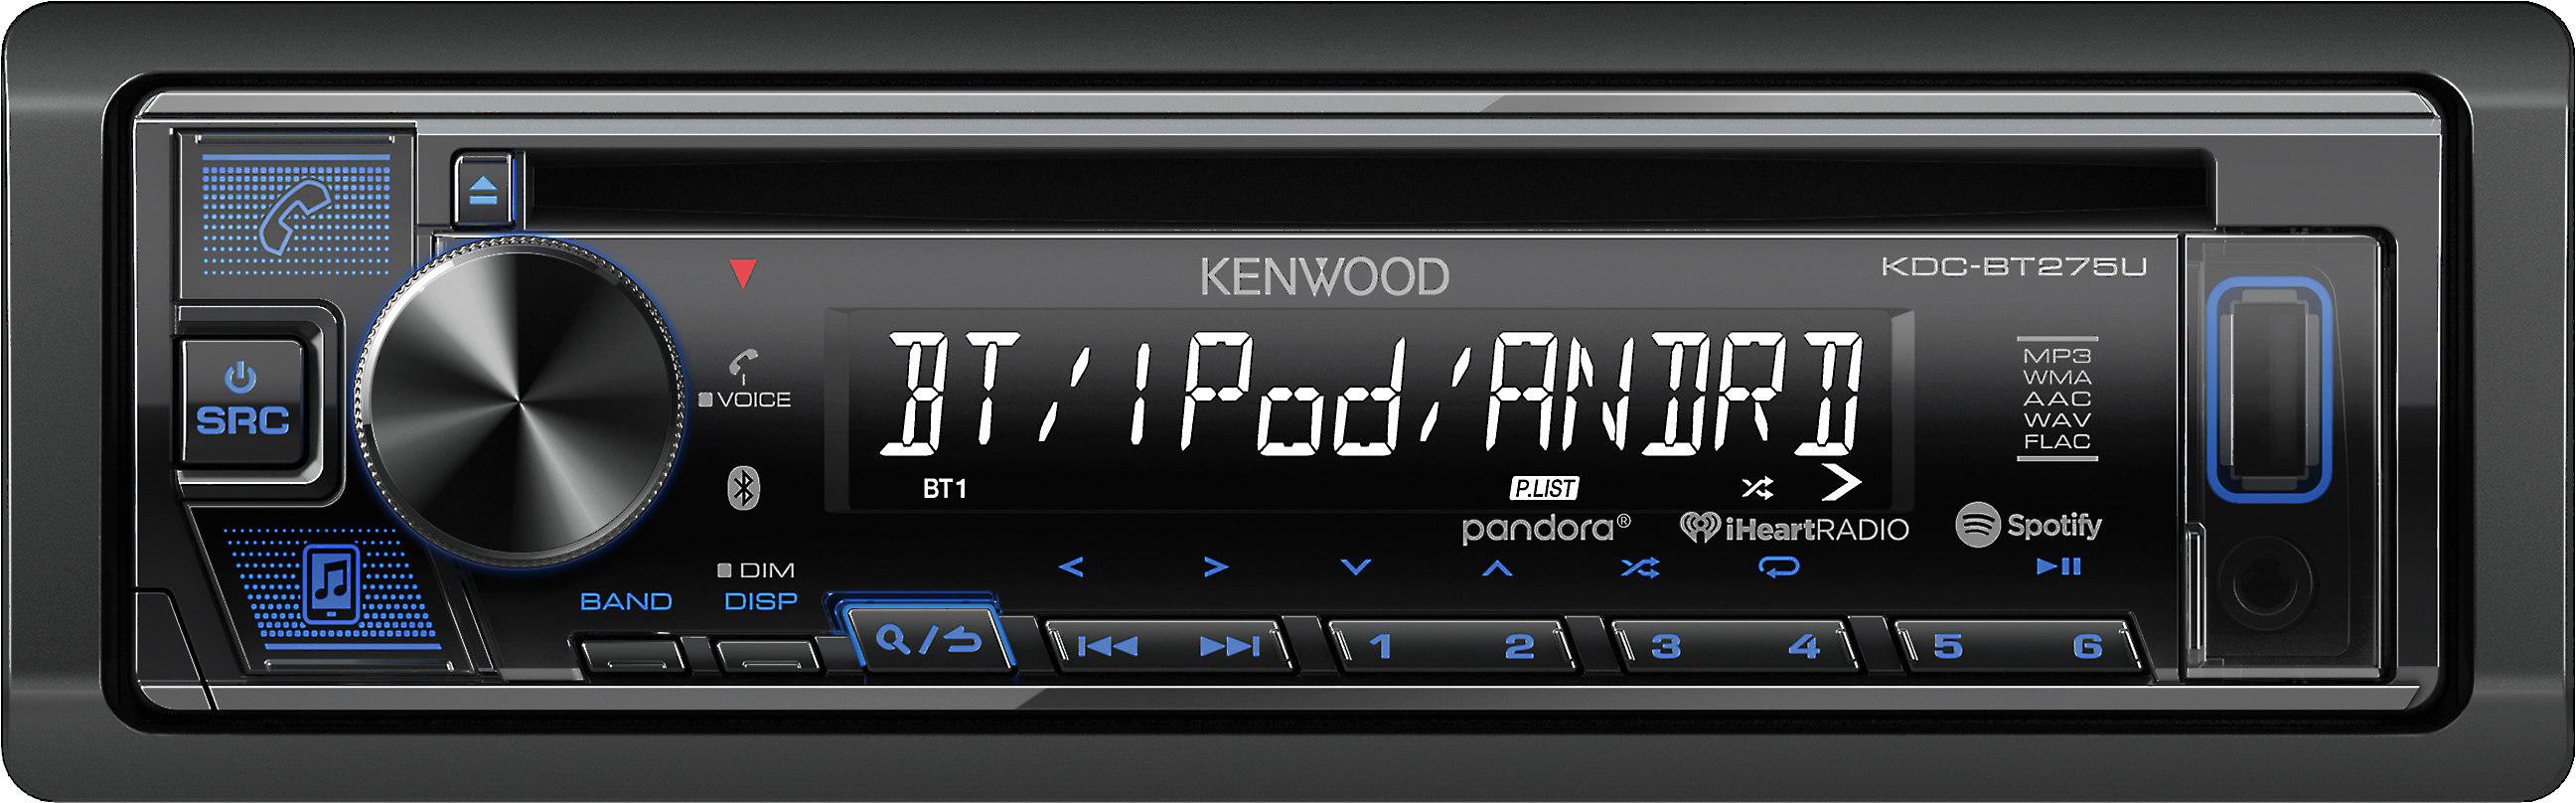 Kenwood KDC-BT275U